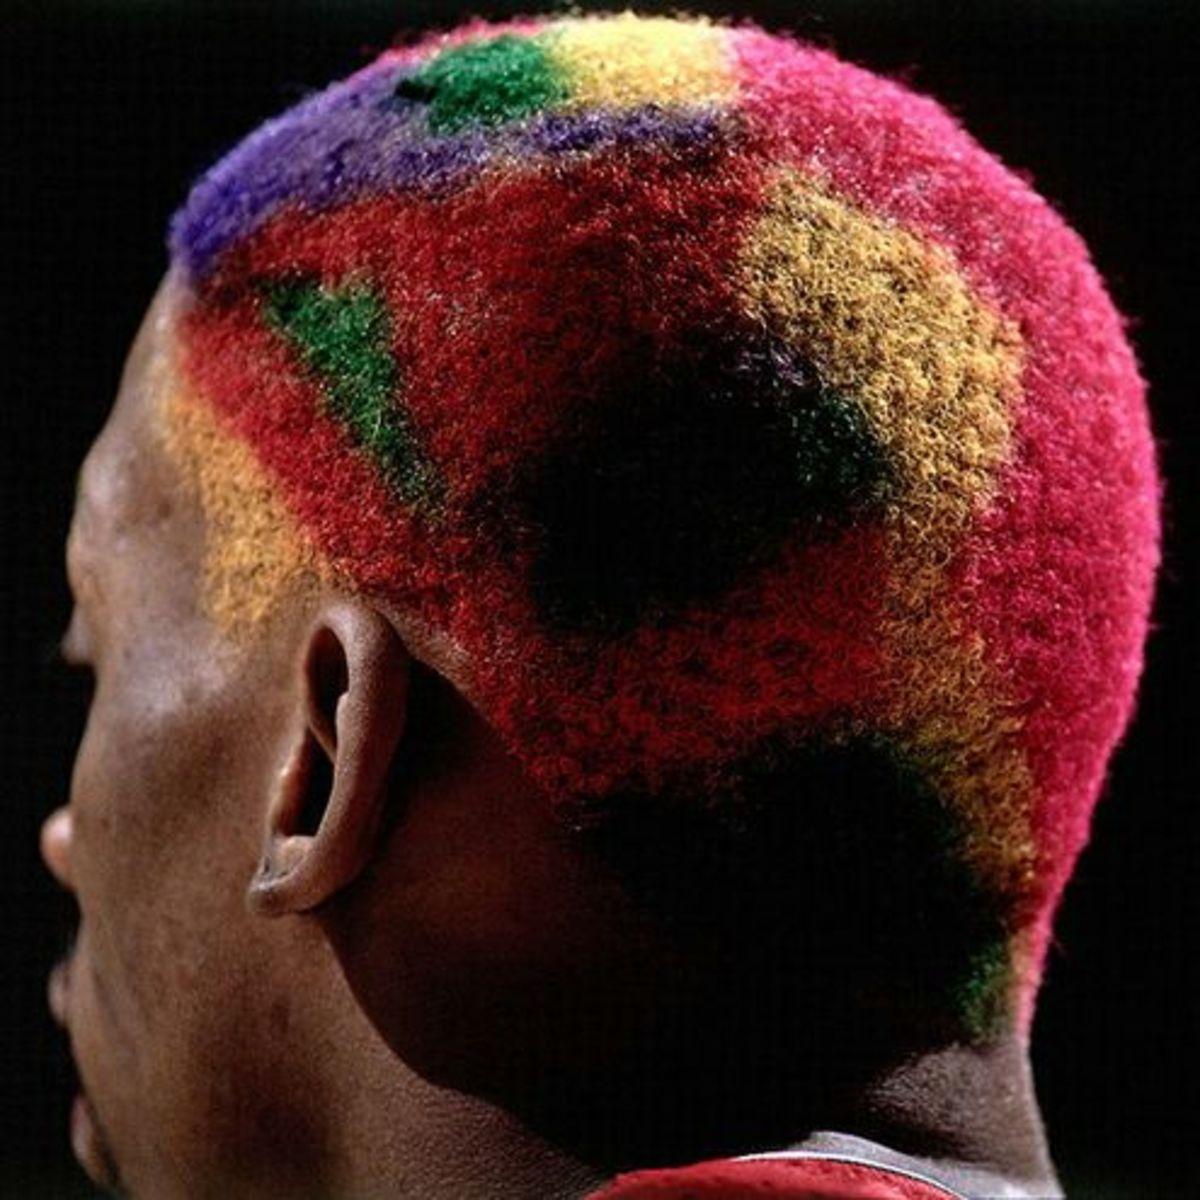 Dennis-Rodman-hair-4